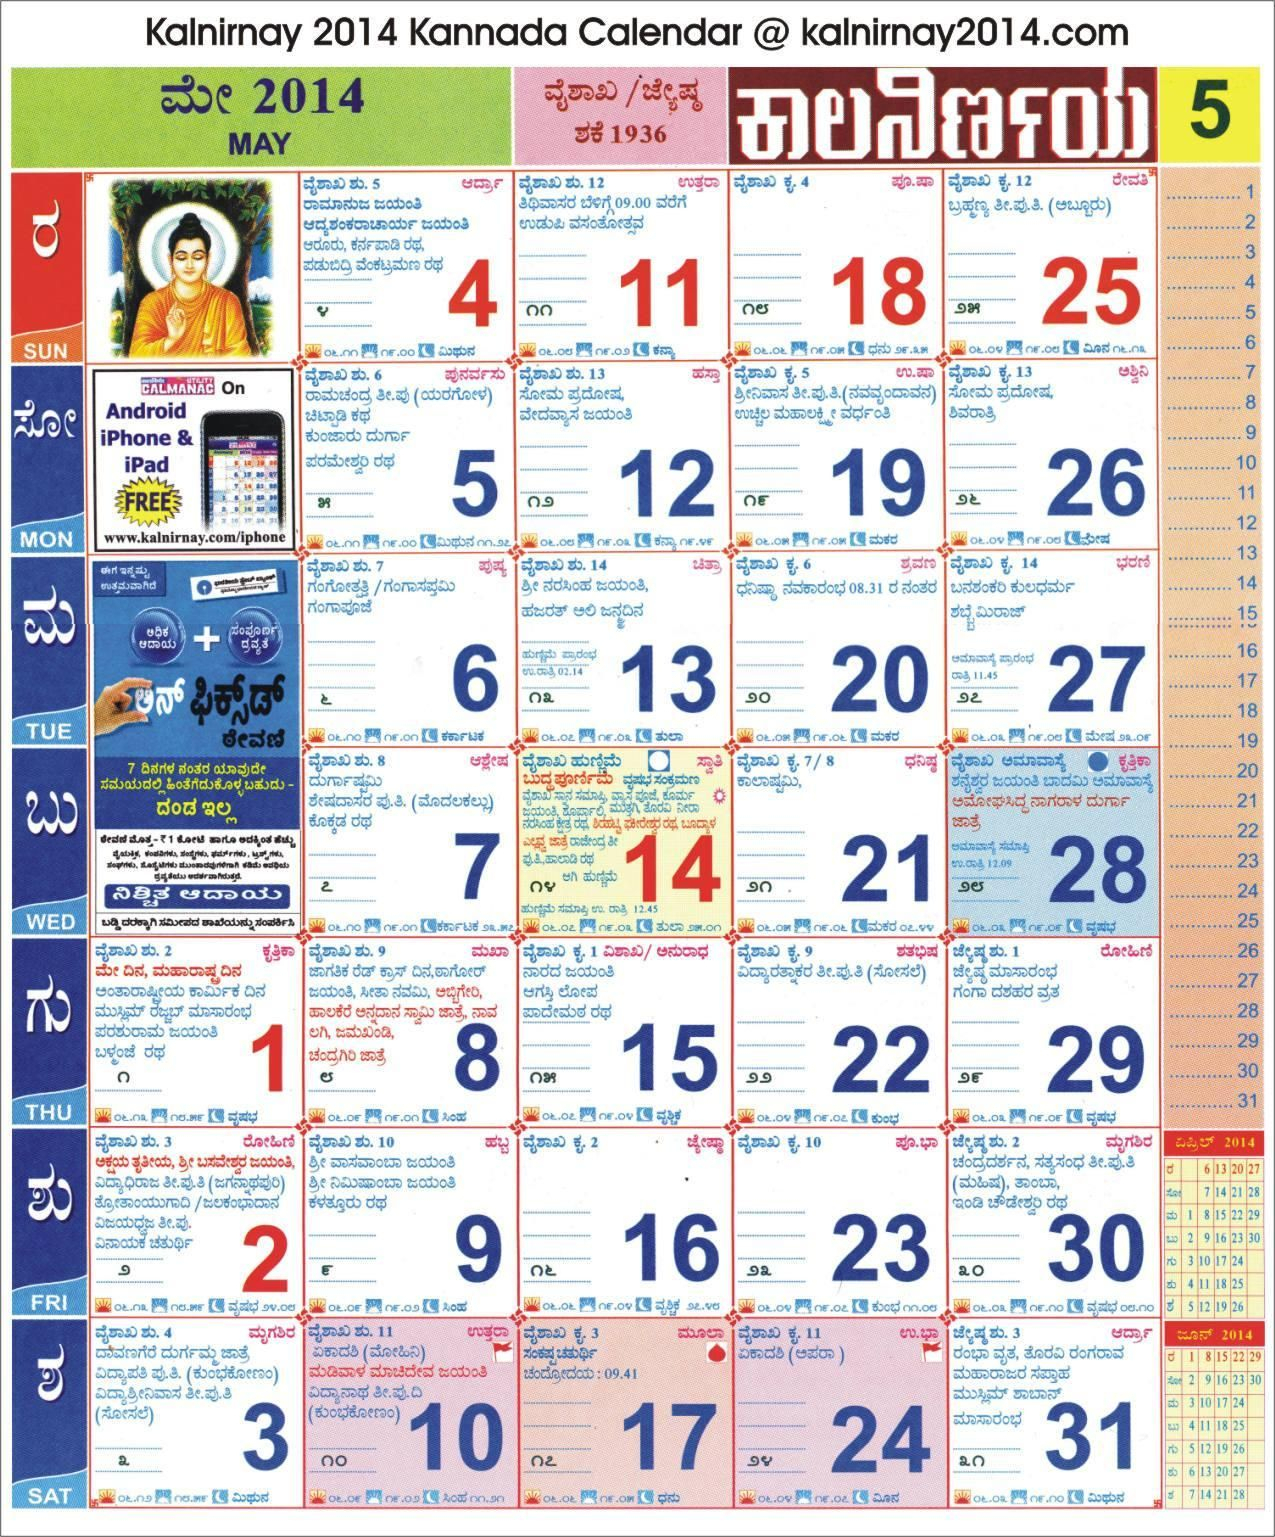 May 2014 Kannada Kalnirnay Calendar | Calendar, Website, October with Kannada Calendar 2020 July